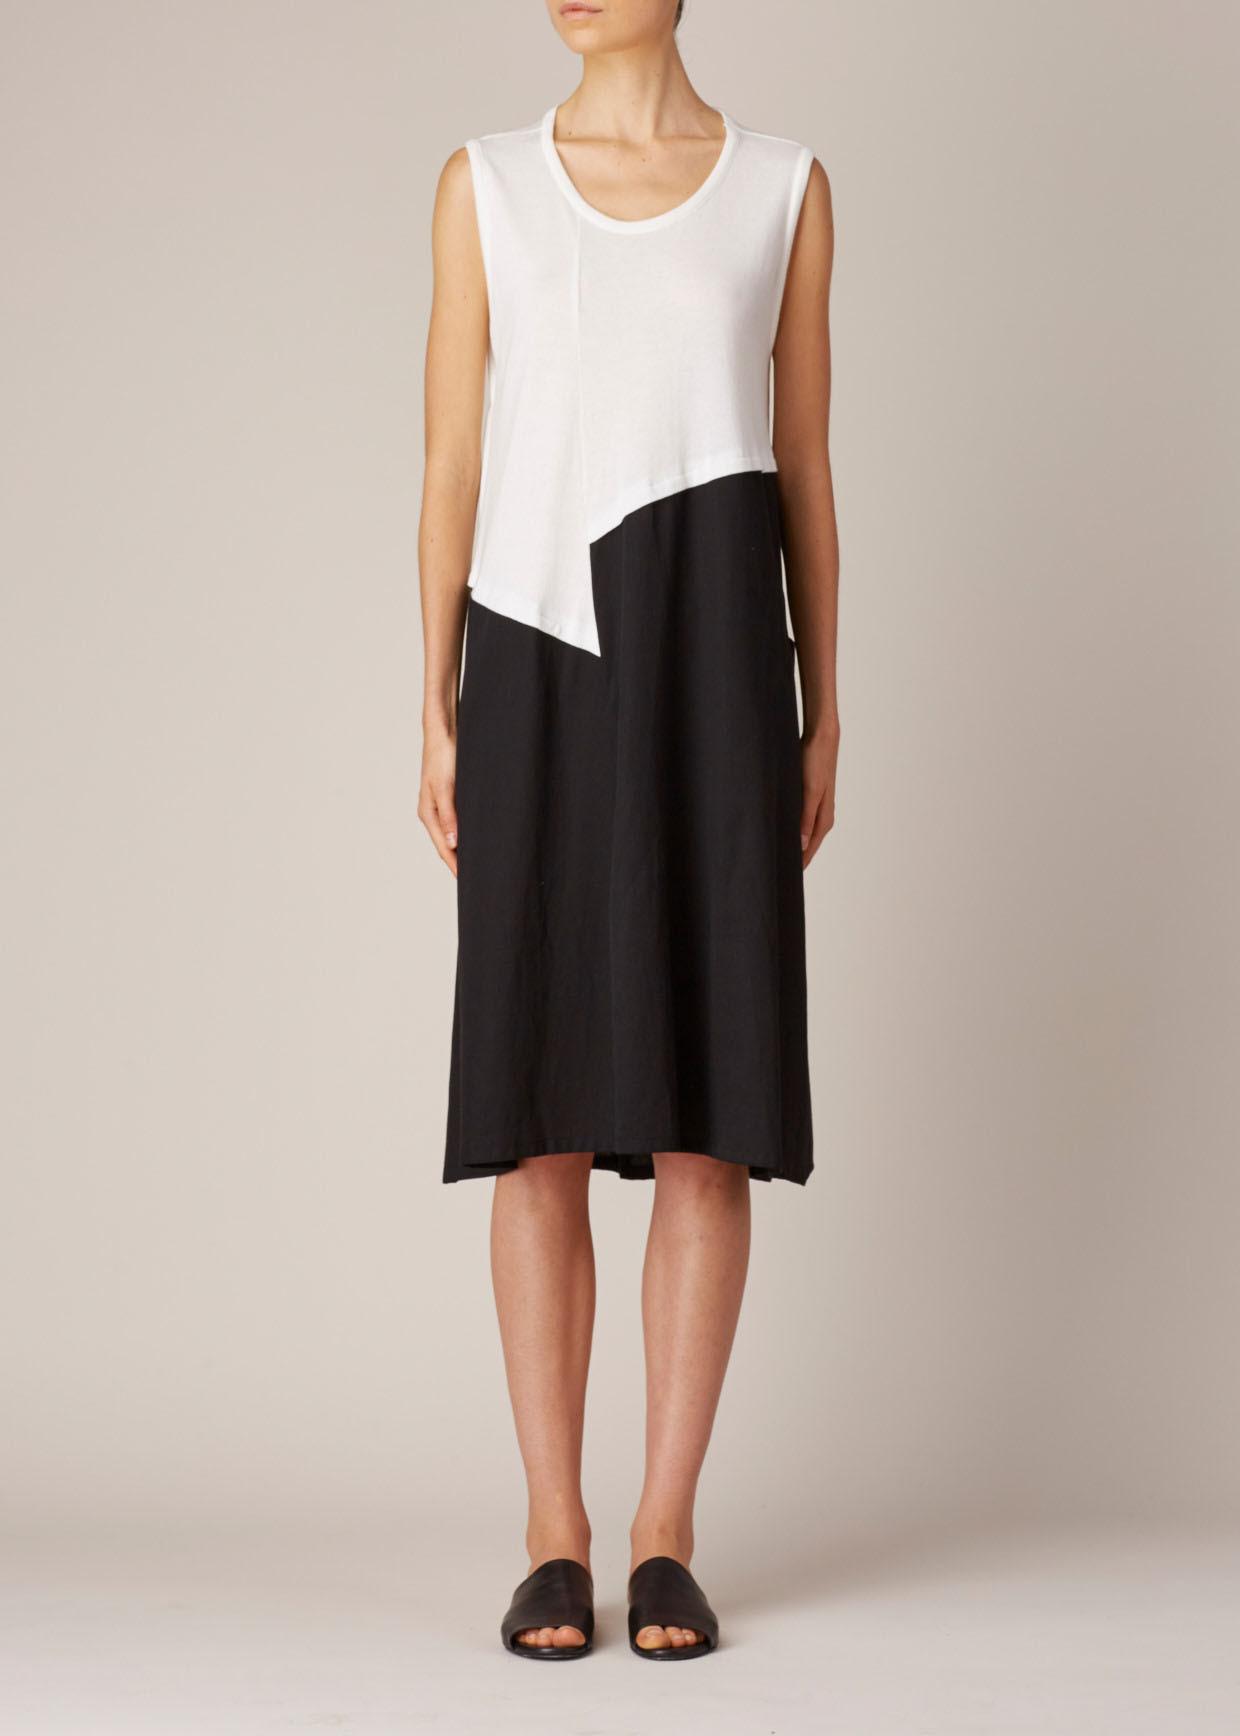 Y S Yohji Yamamoto White Black Yoke Tank Top Dress Lyst